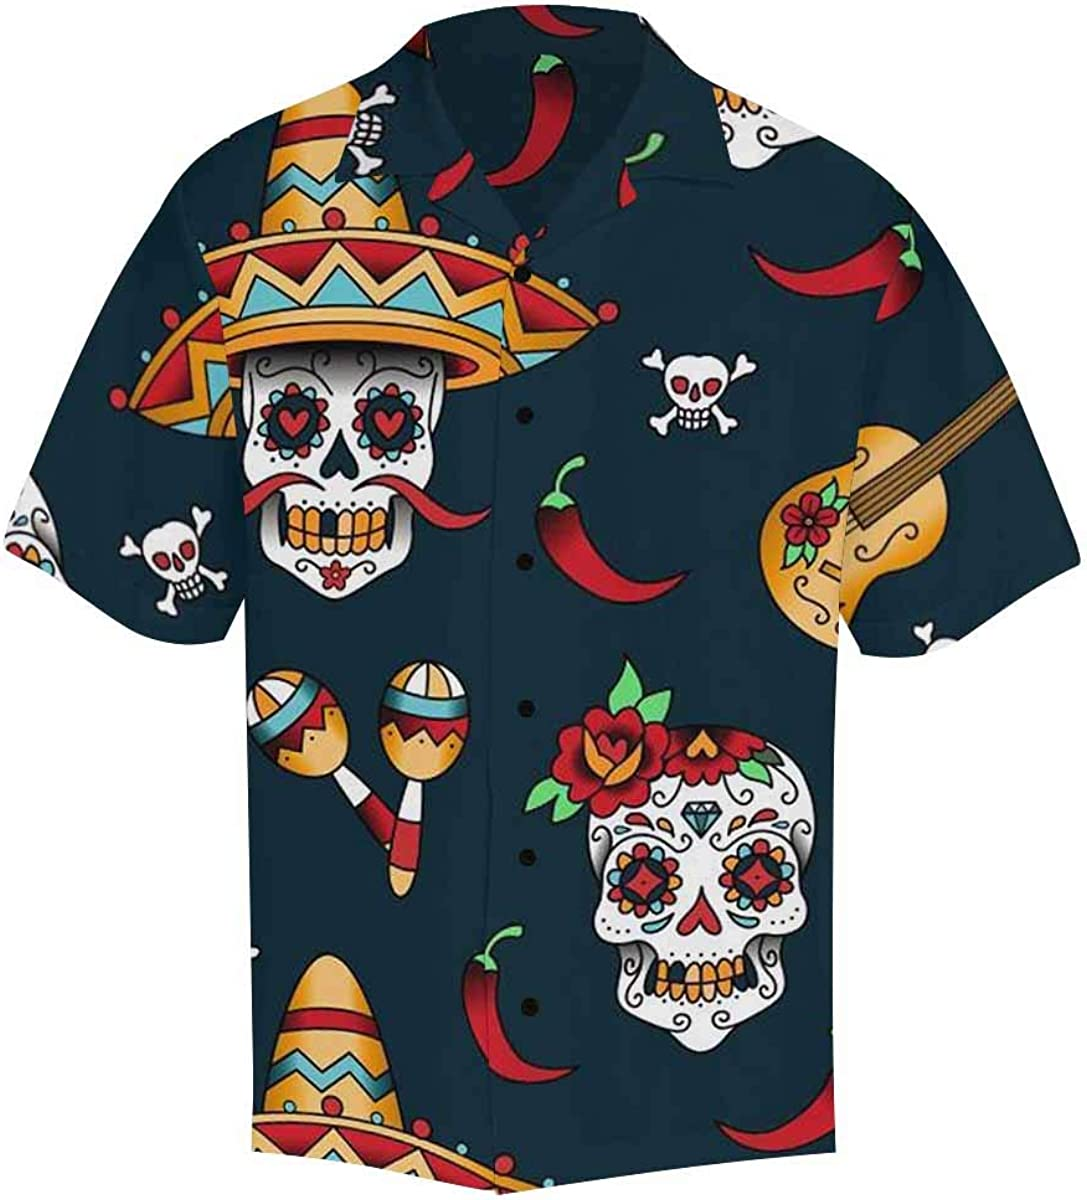 InterestPrint Men's All Over Printing Short Sleeve Hawaiian Shirt Casual Unique Design Mexican Sugar Skulls with Chili Pepper